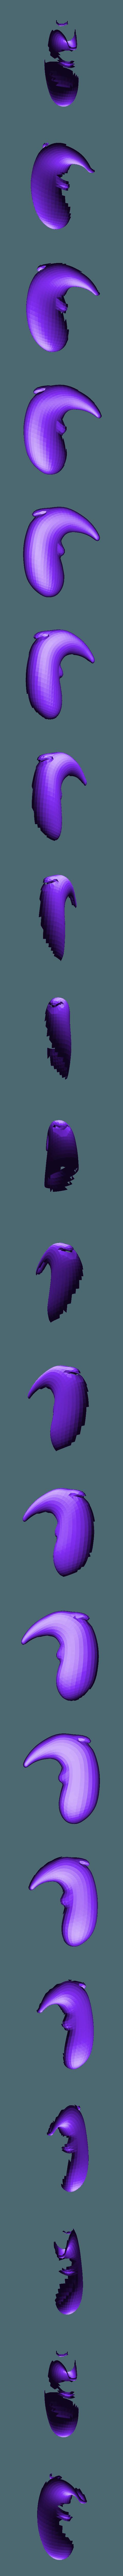 Applebloom_queue.stl Download free STL file MLP Applebloom Pony • Template to 3D print, arcandg